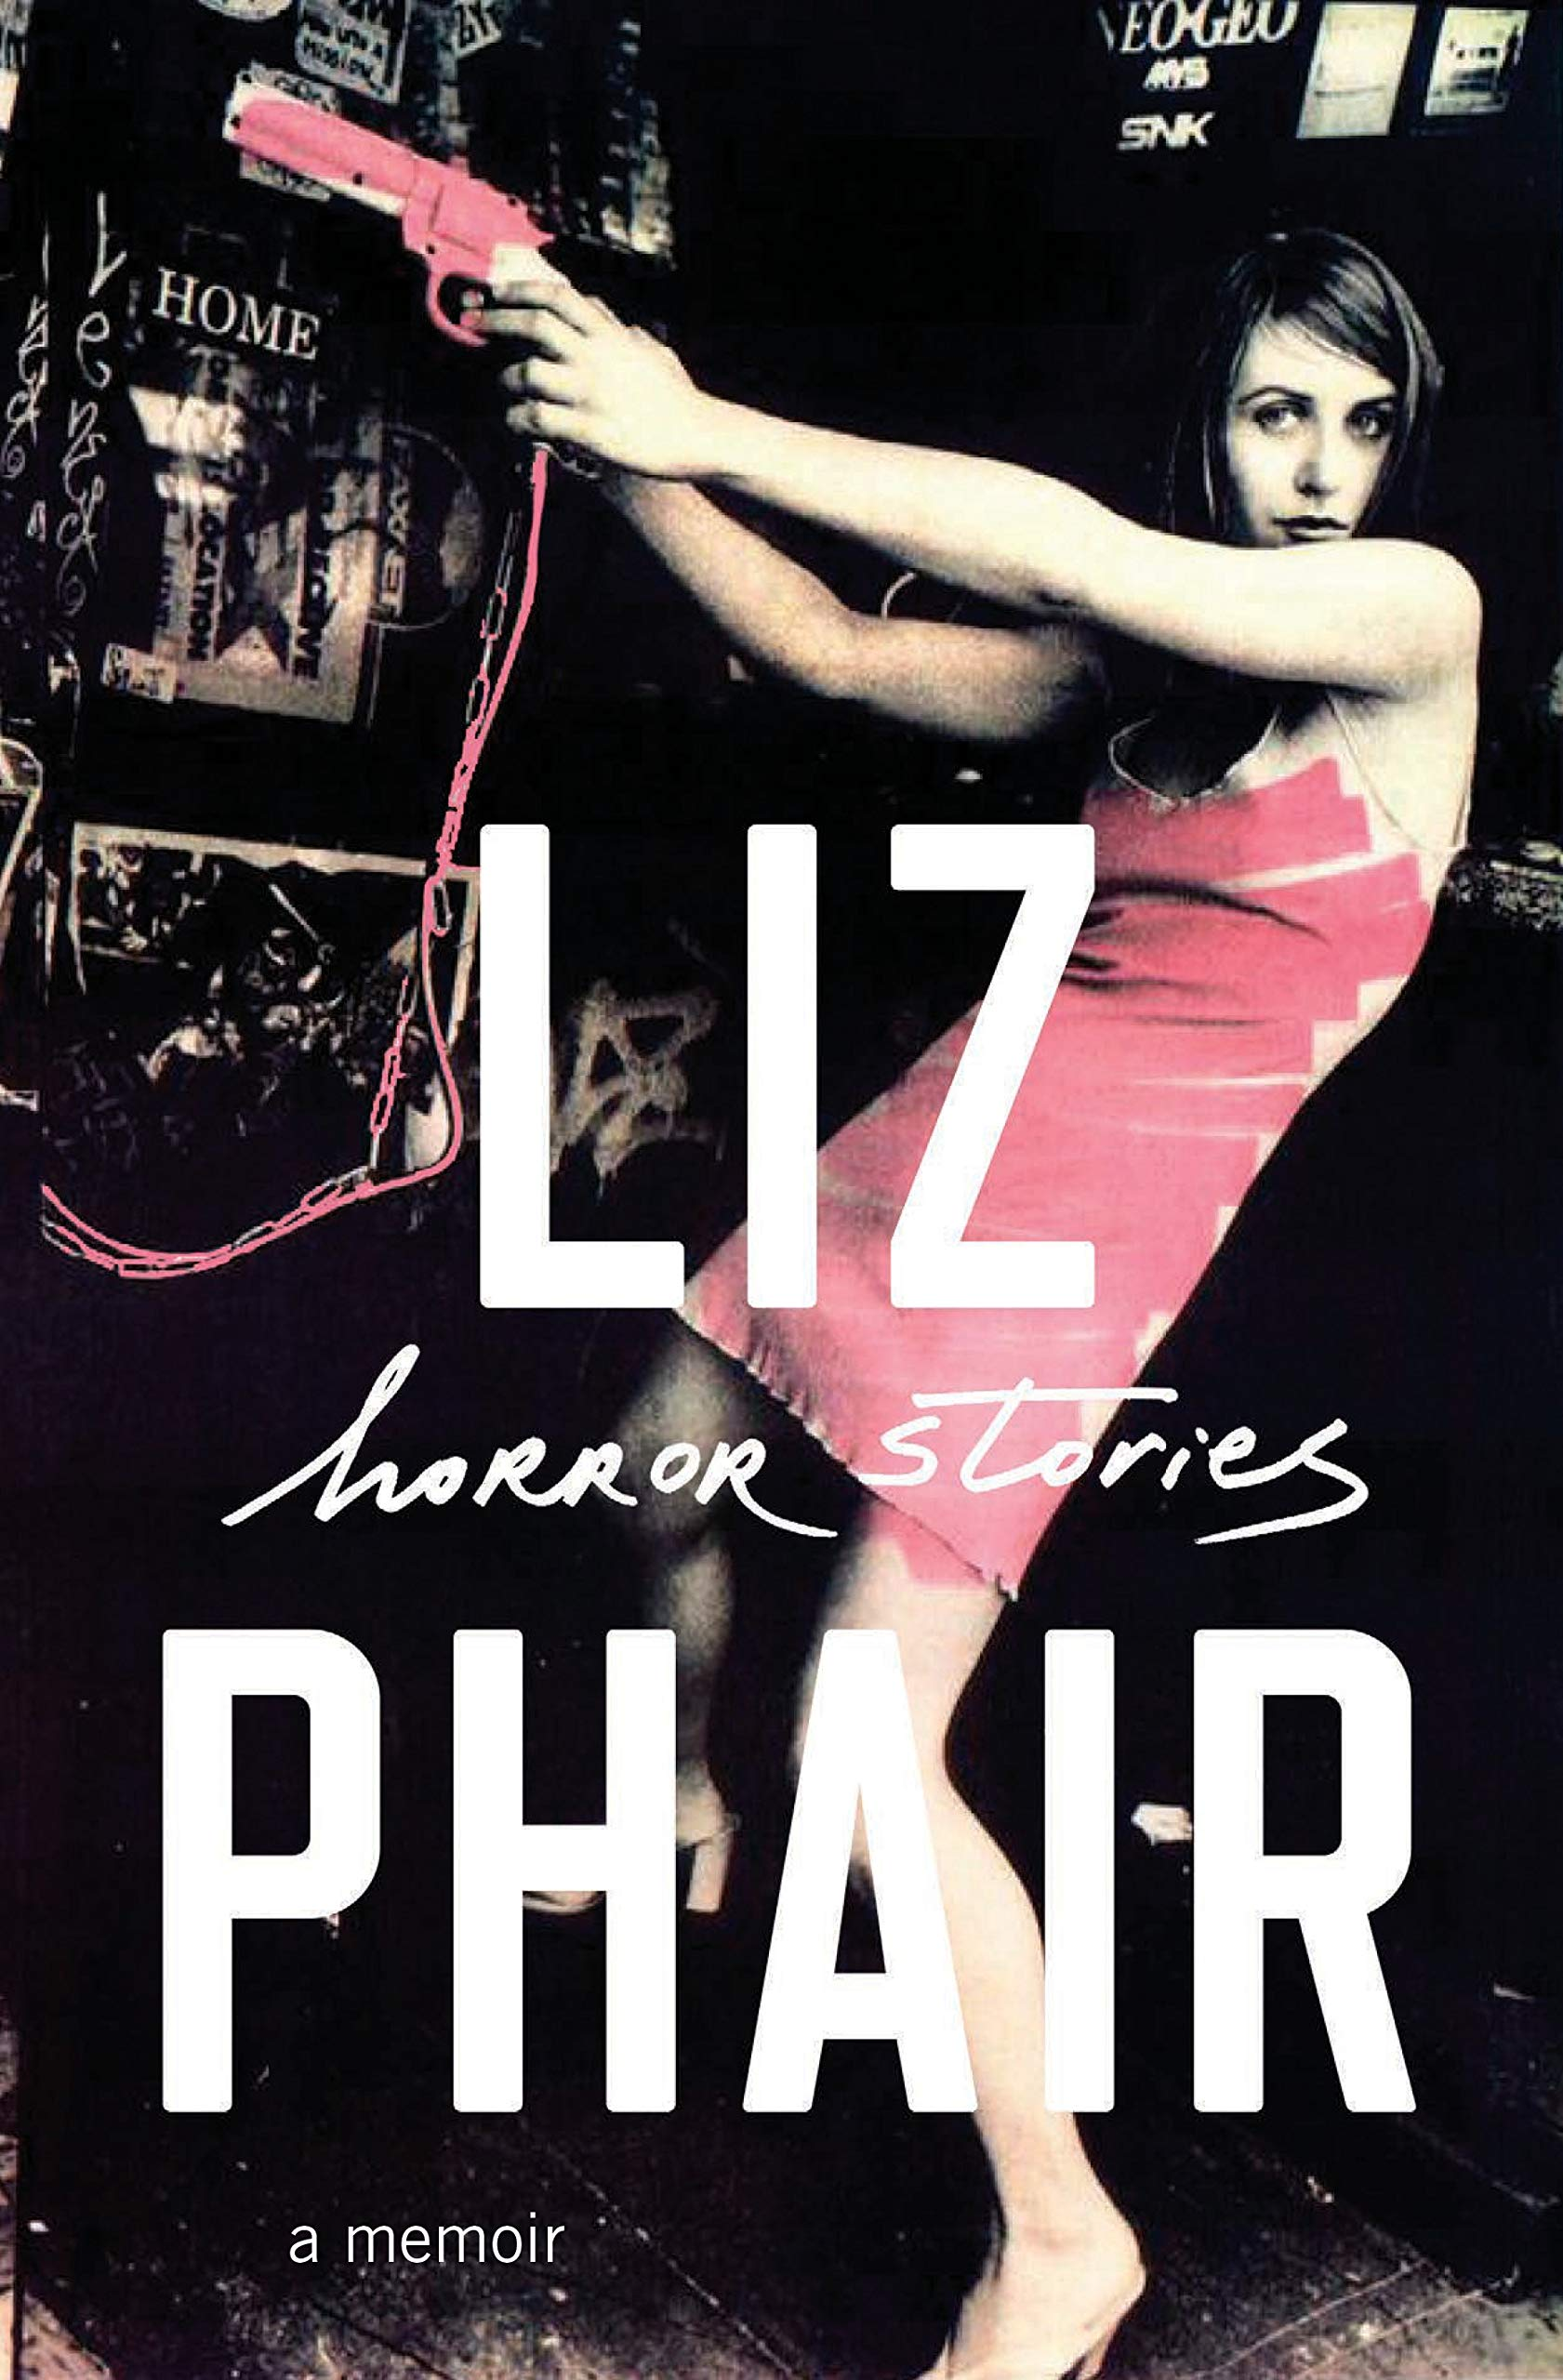 Horror Stories: A Memoir by Random House